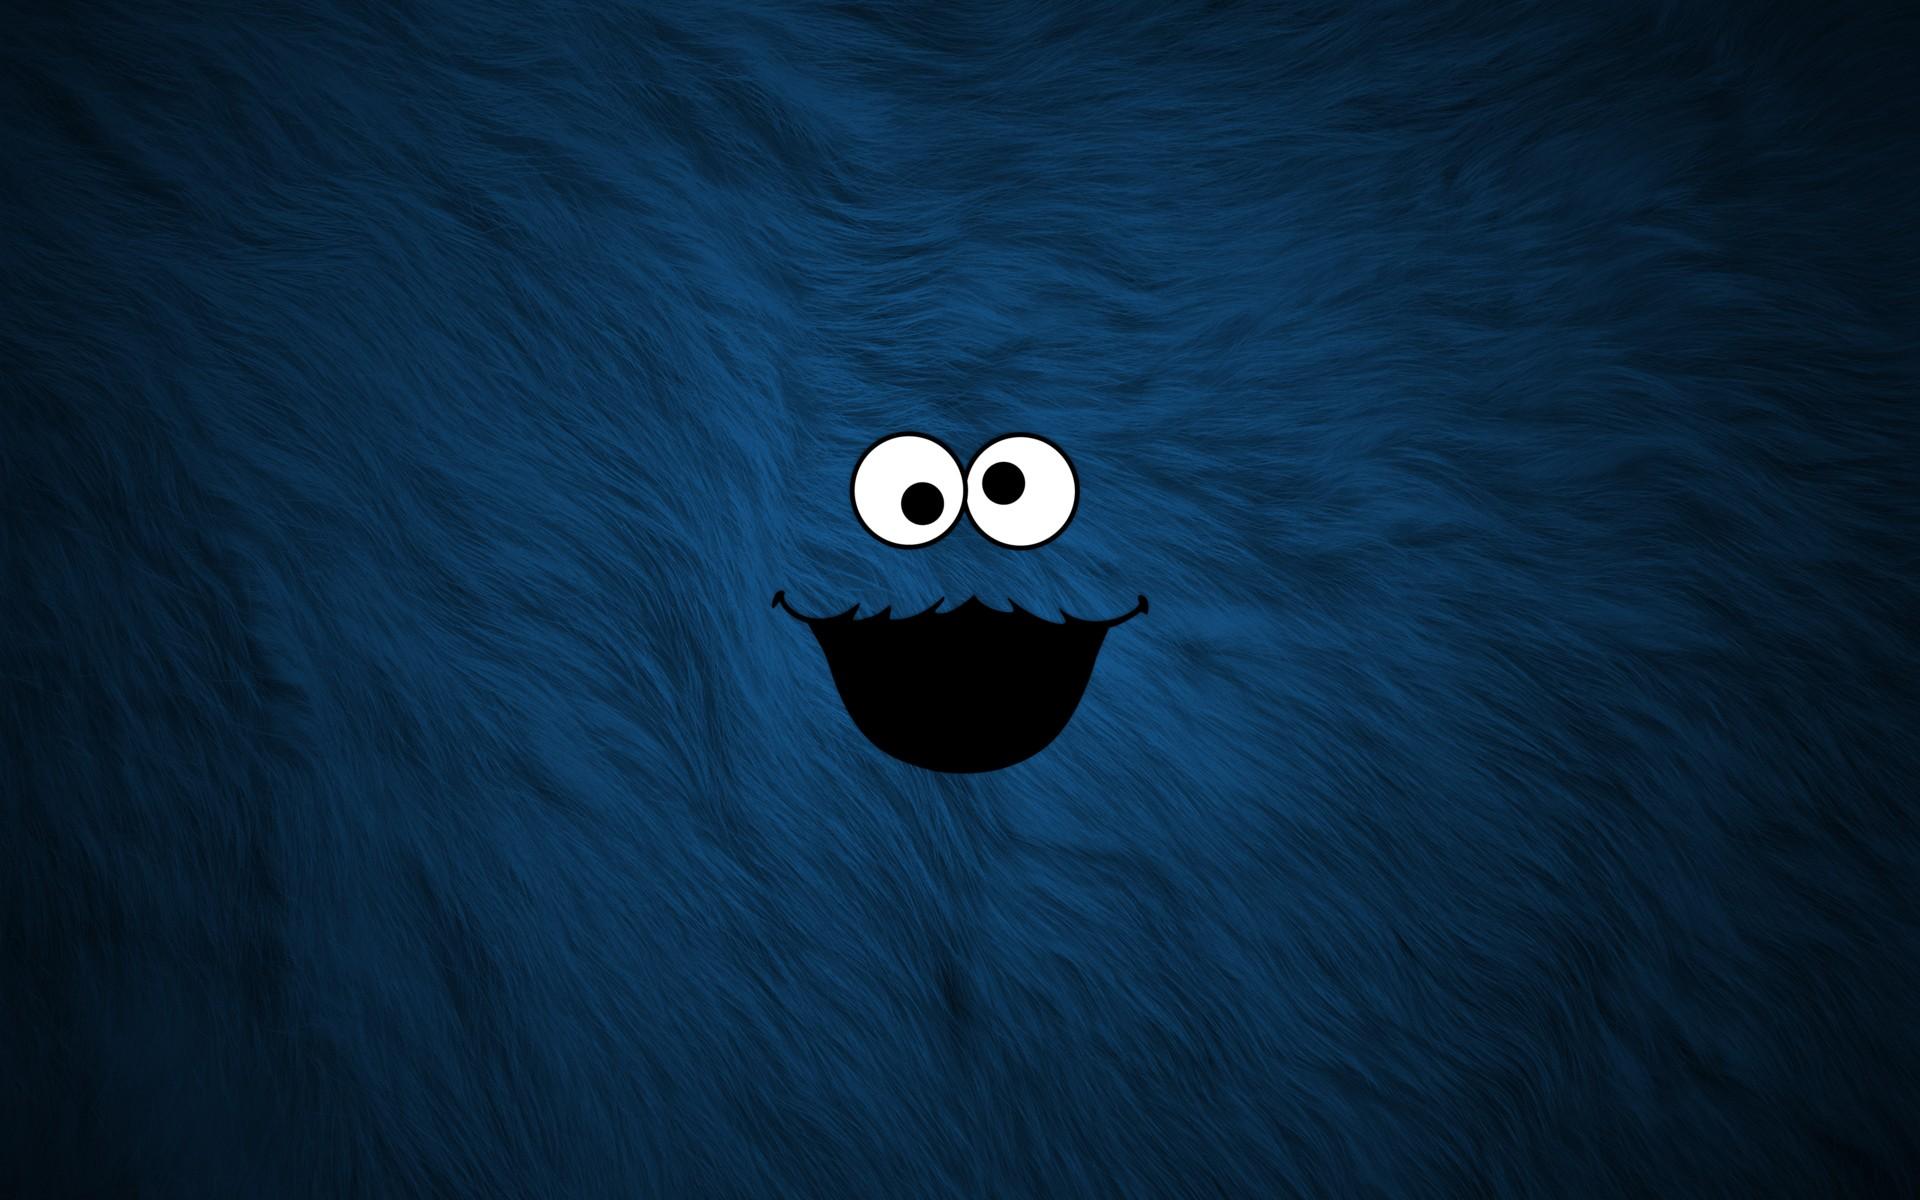 Cookie Monster Wallpaper 1920x1200 Cookie Monster 1920x1200